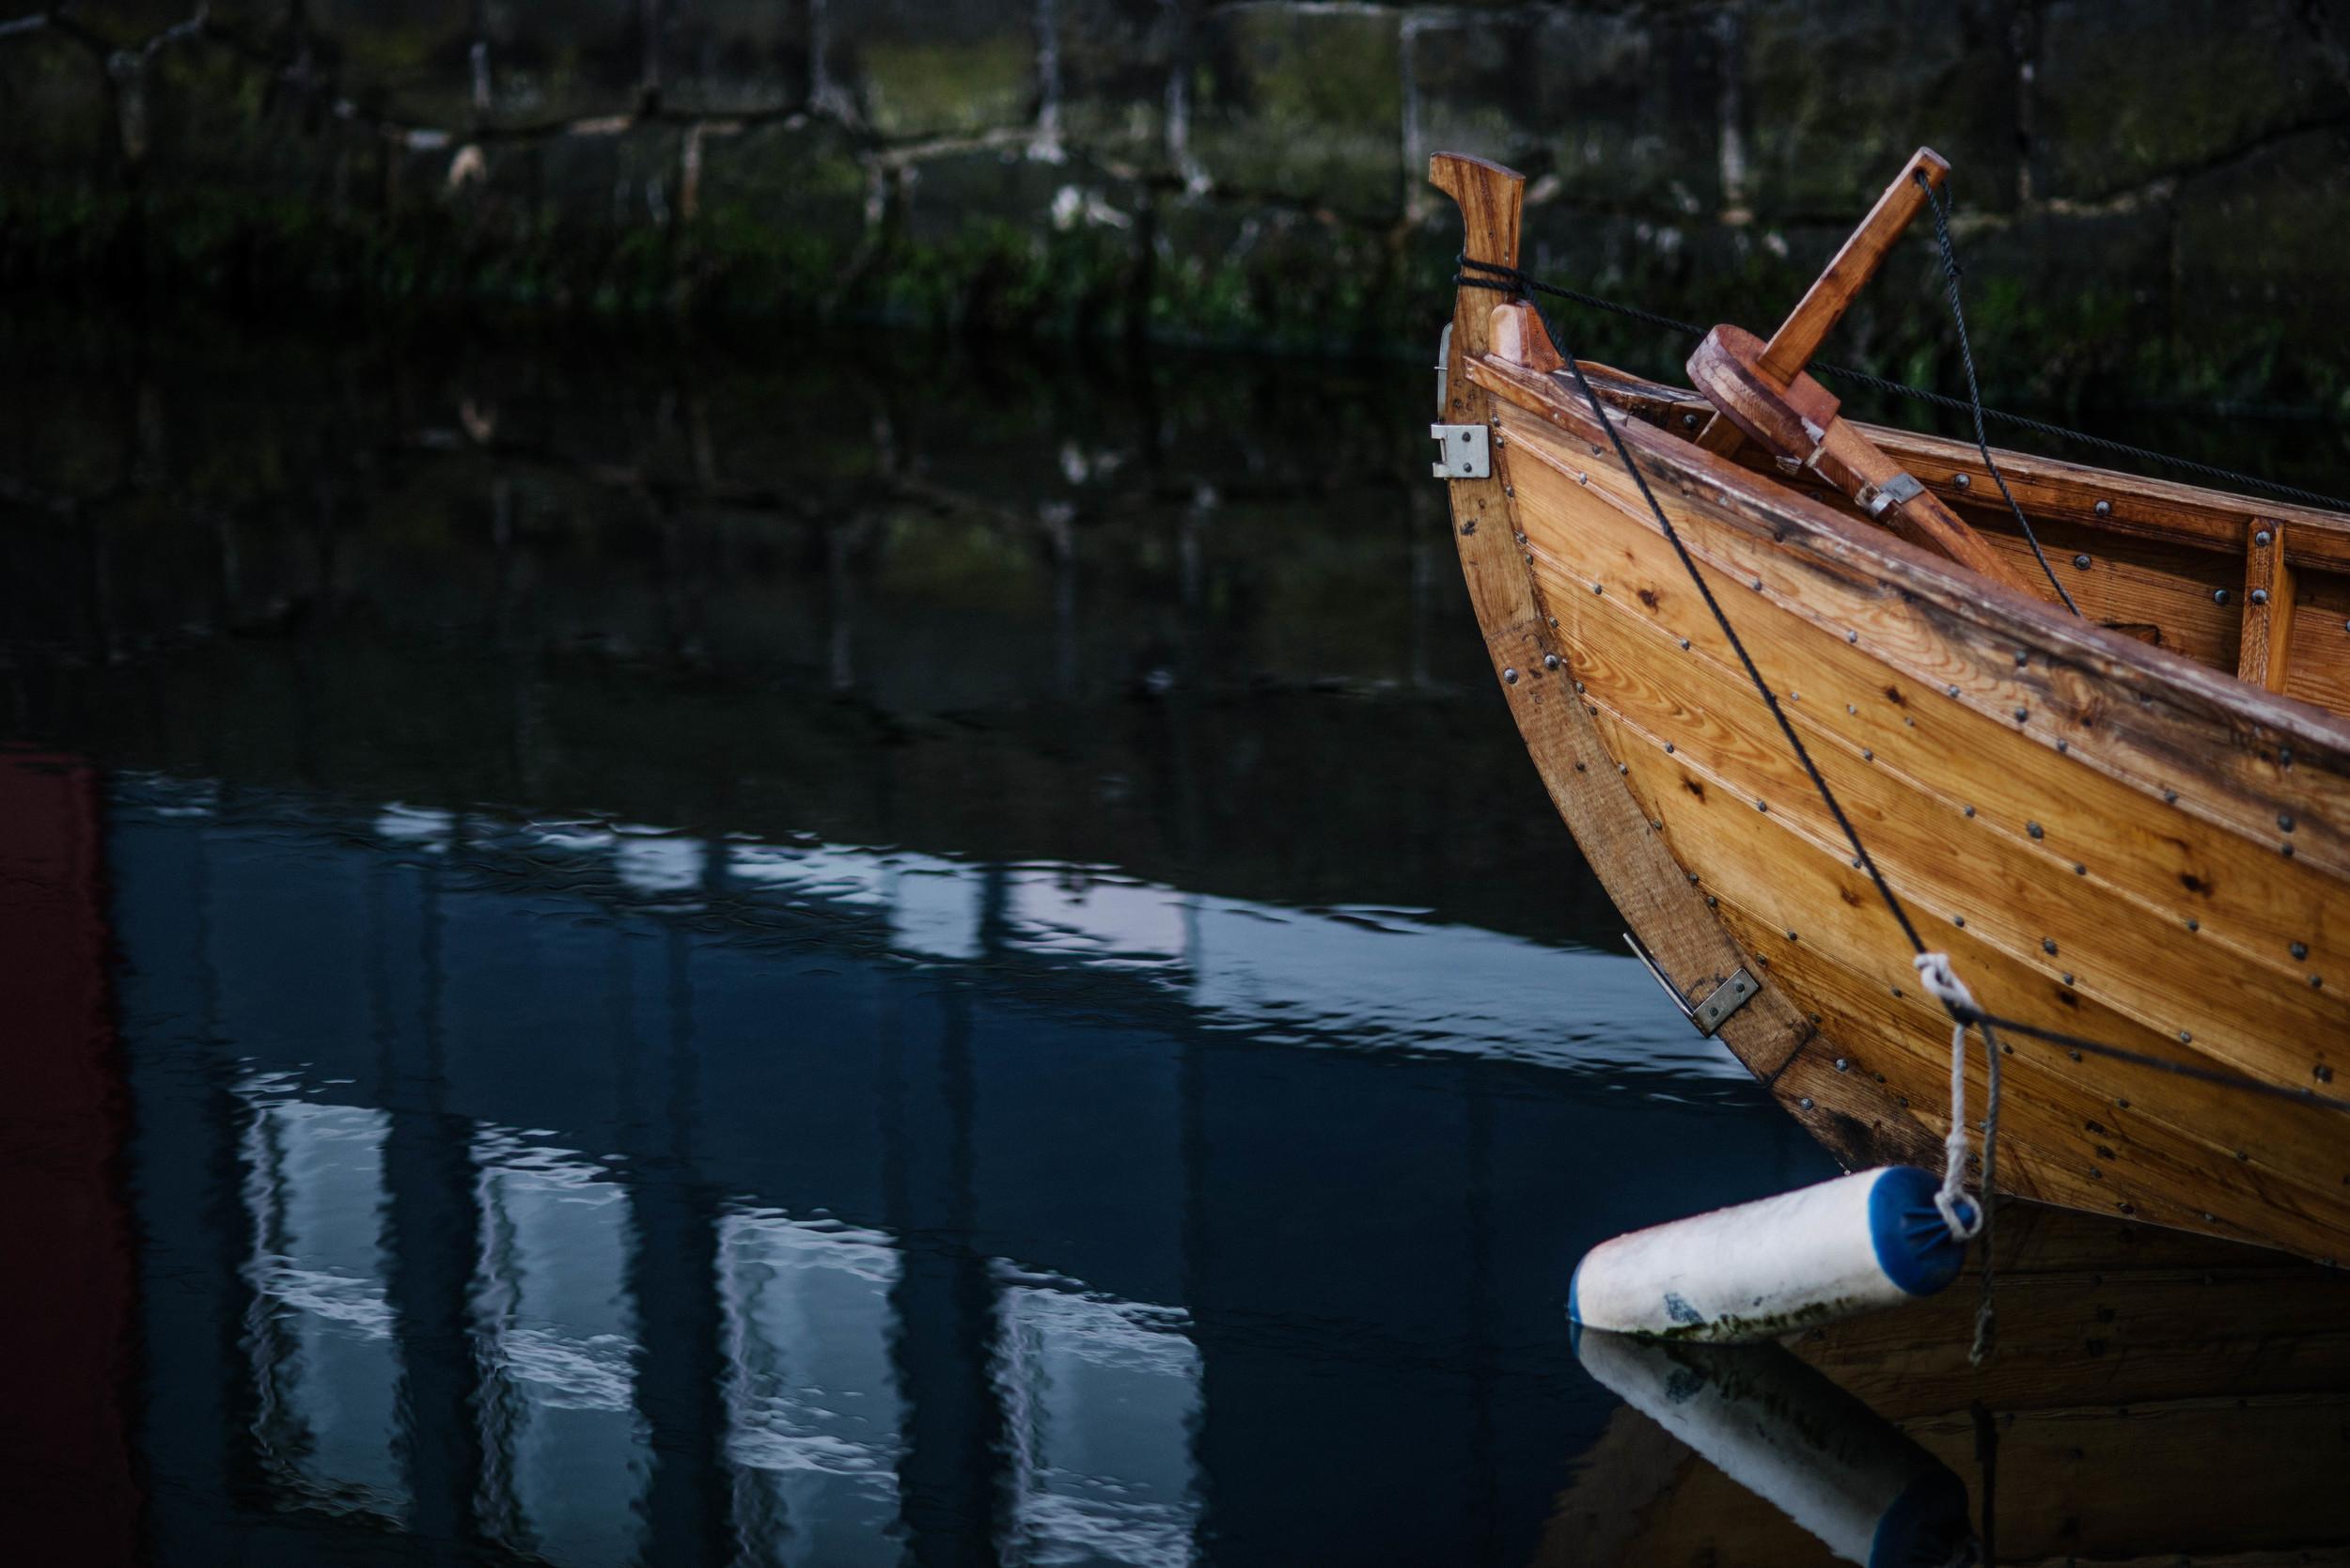 Faroes_Torshavn_1-7136.jpg